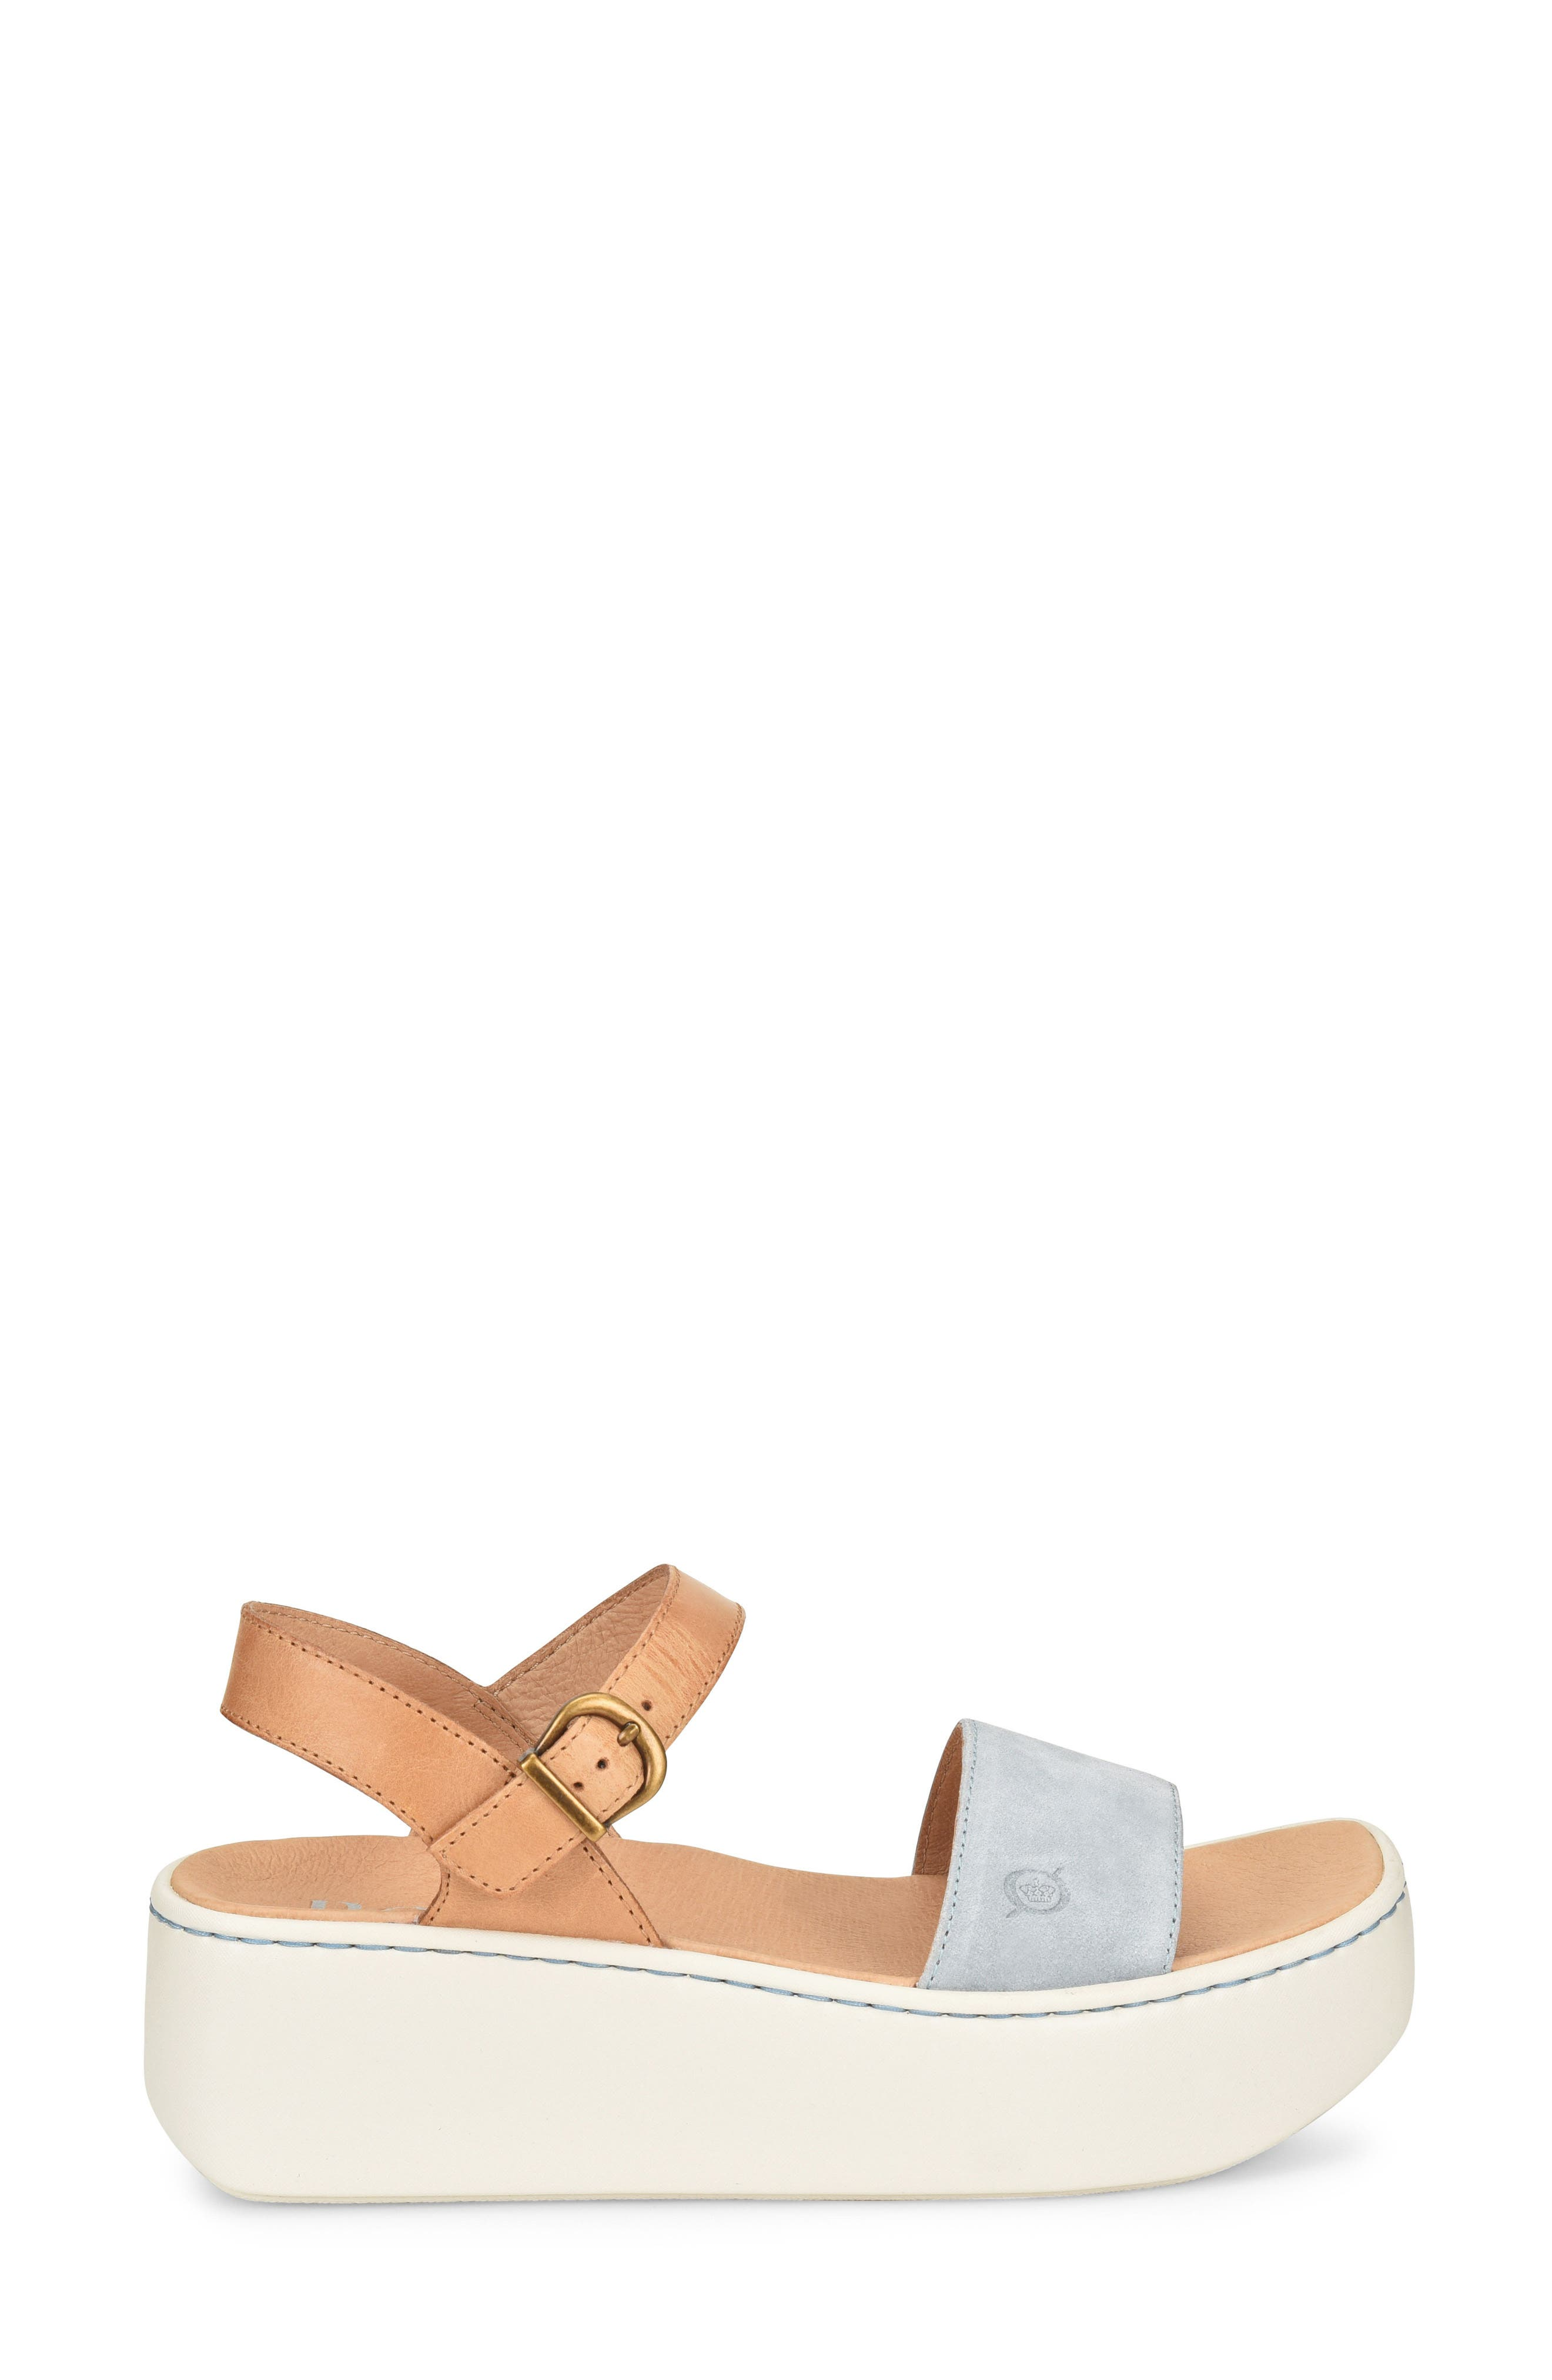 Breaker Platform Sandal,                             Alternate thumbnail 3, color,                             Light Blue/ Tan Leather